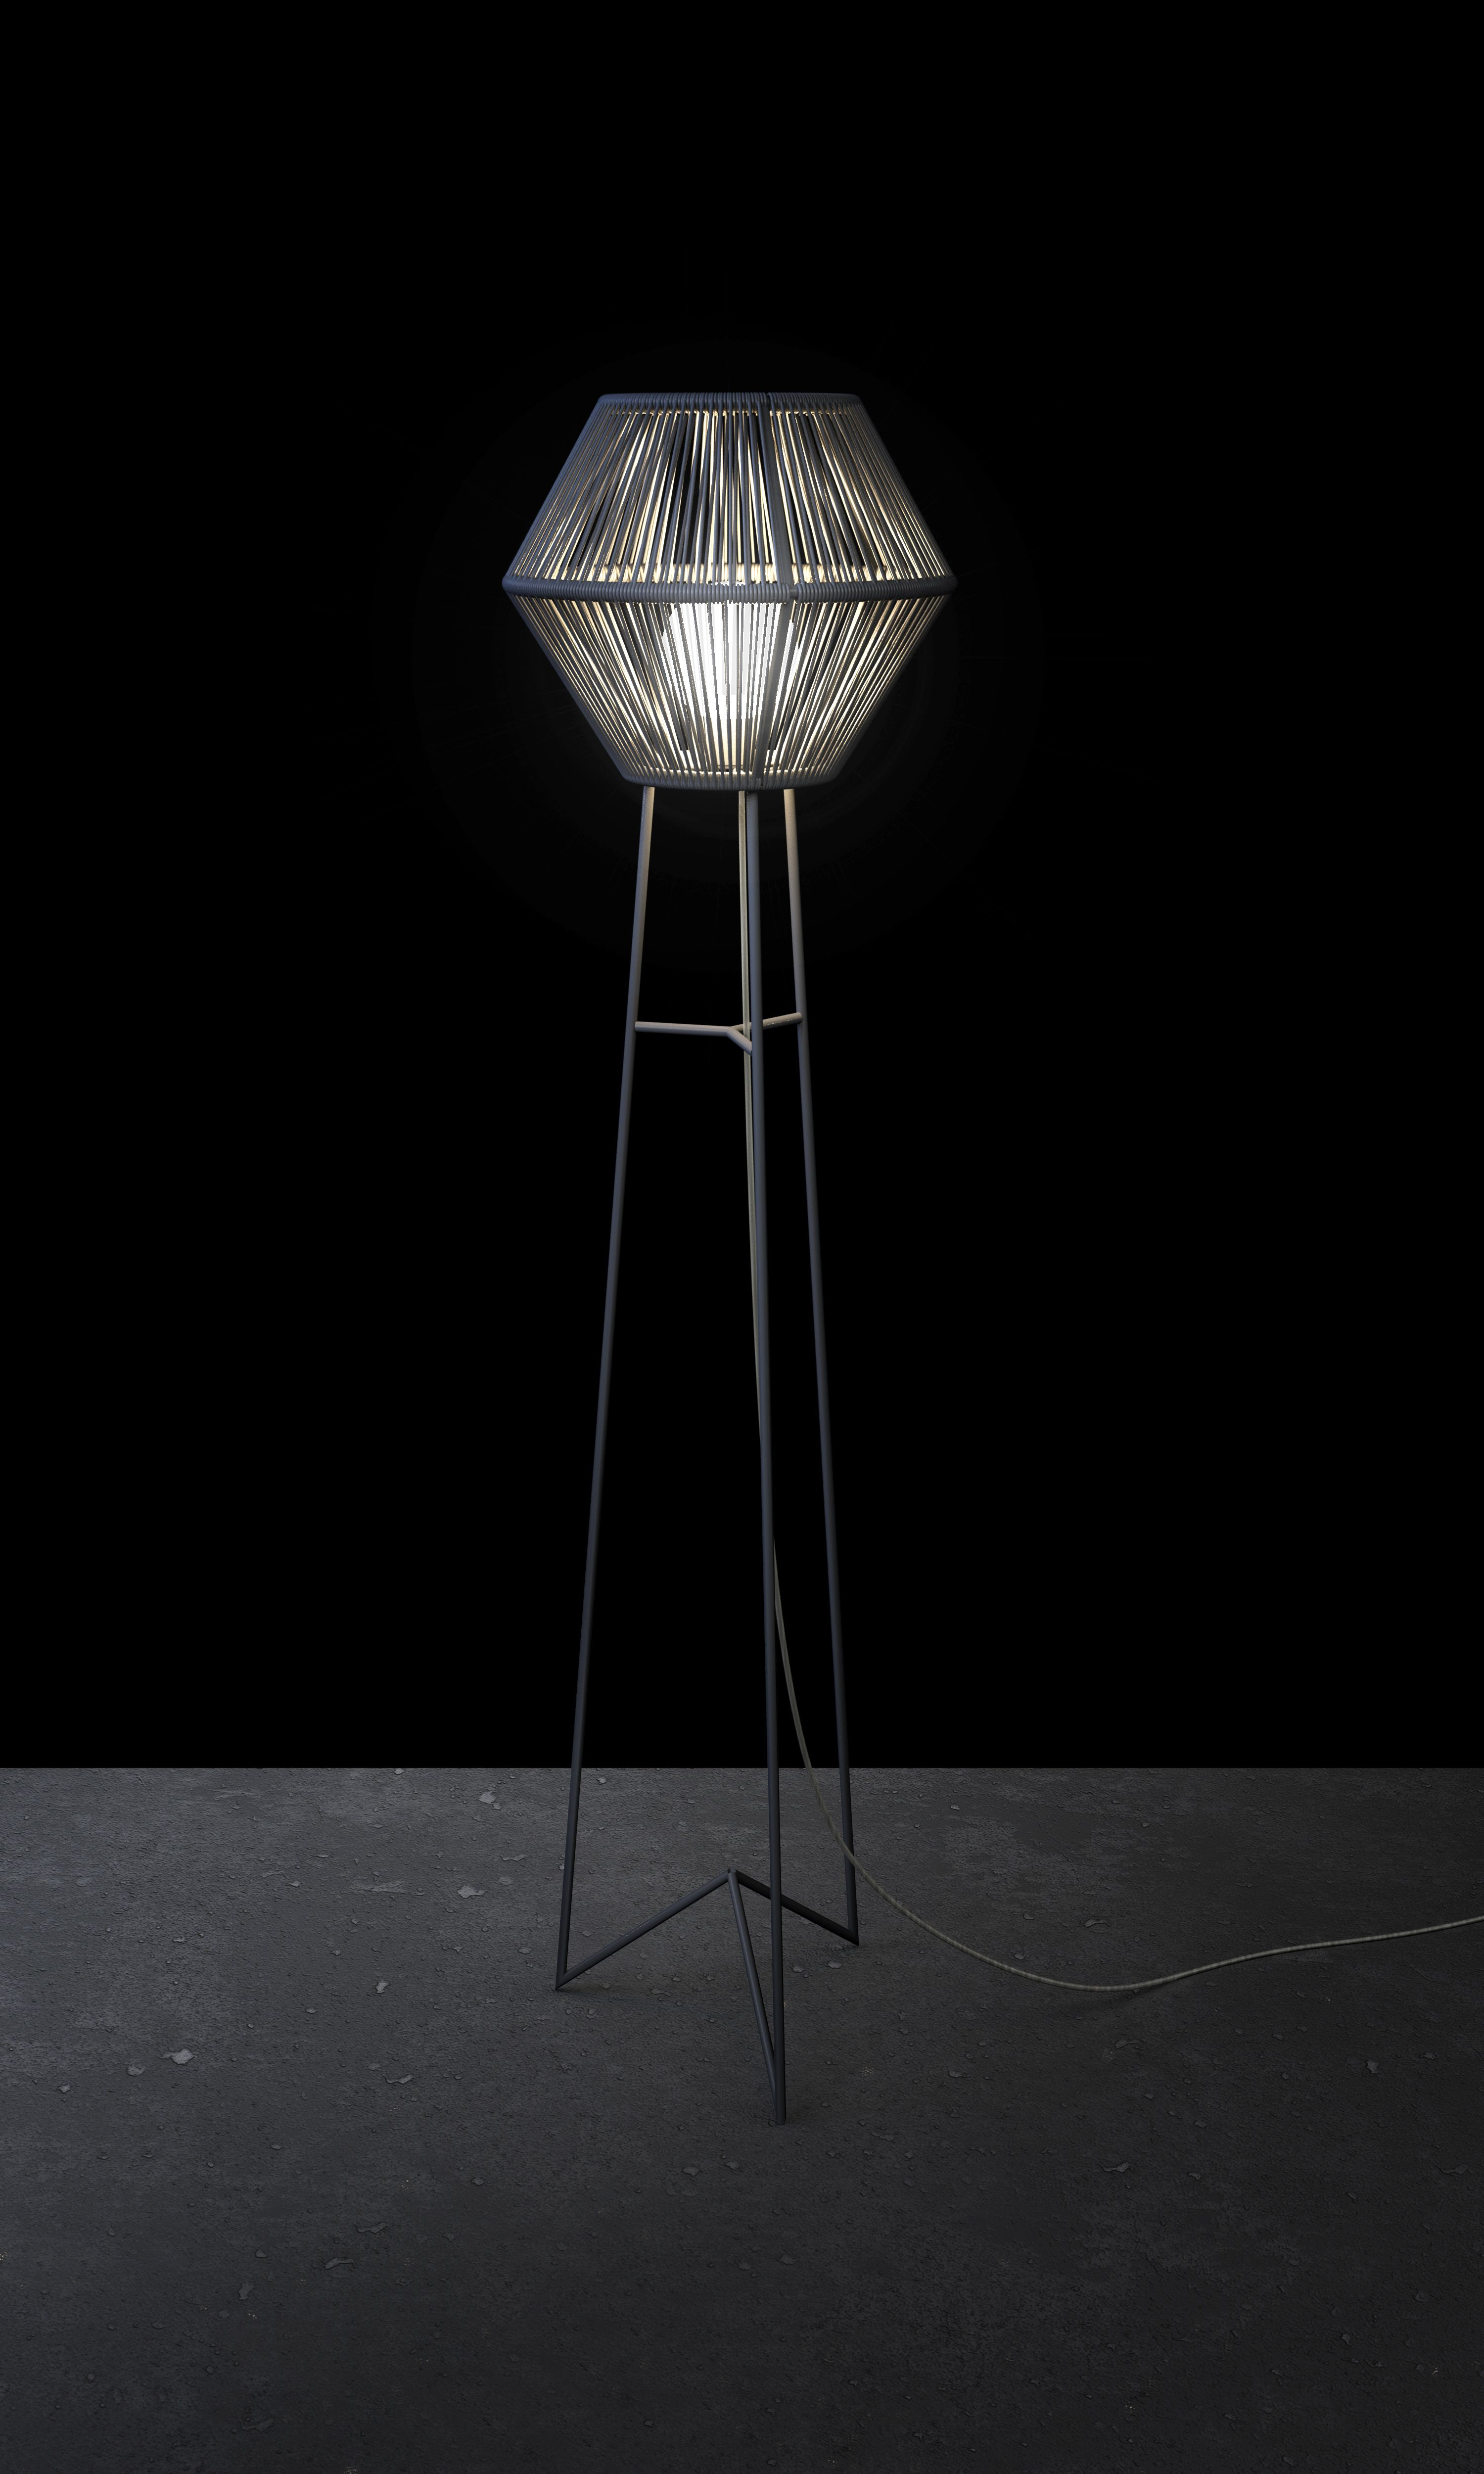 La Caleta   lighting design by davidpompa   woven plastic string ... for String Floor Lamp  lp5fsj